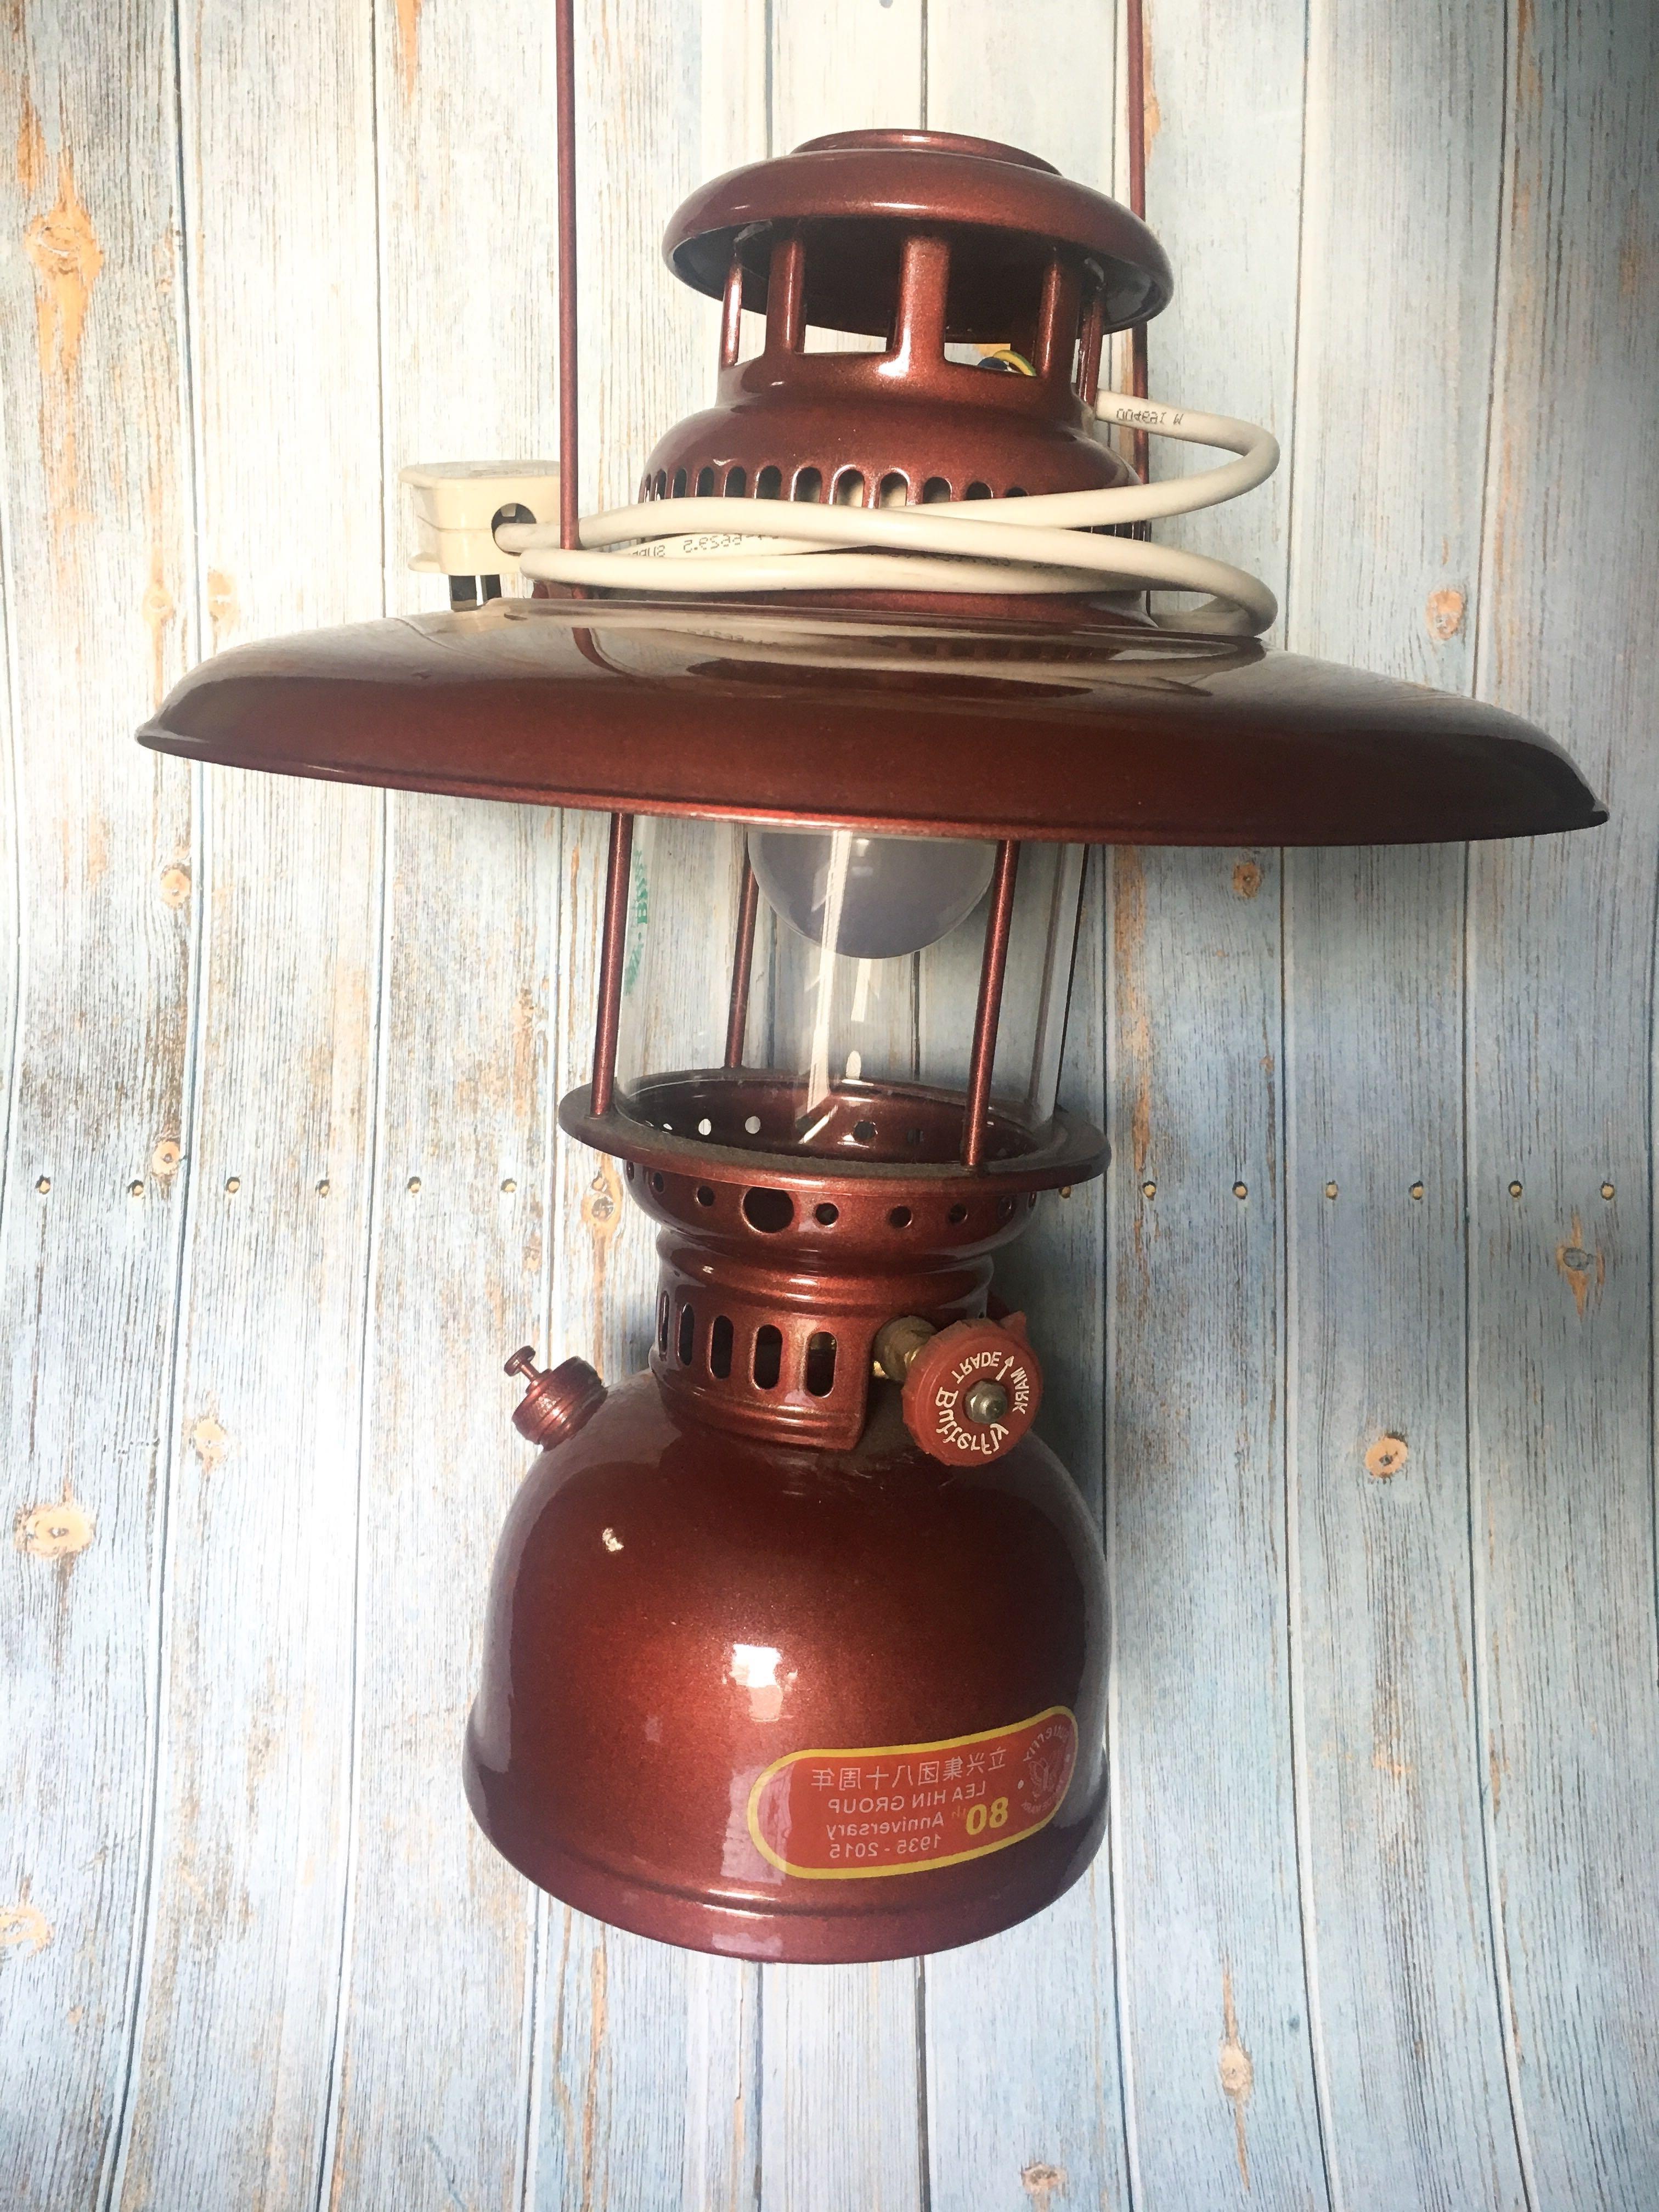 Trendy Can Nego* Vintage Kerosene Lamp Maroon Antique With Led Light Bulb Pertaining To Decorative Outdoor Kerosene Lanterns (View 13 of 20)